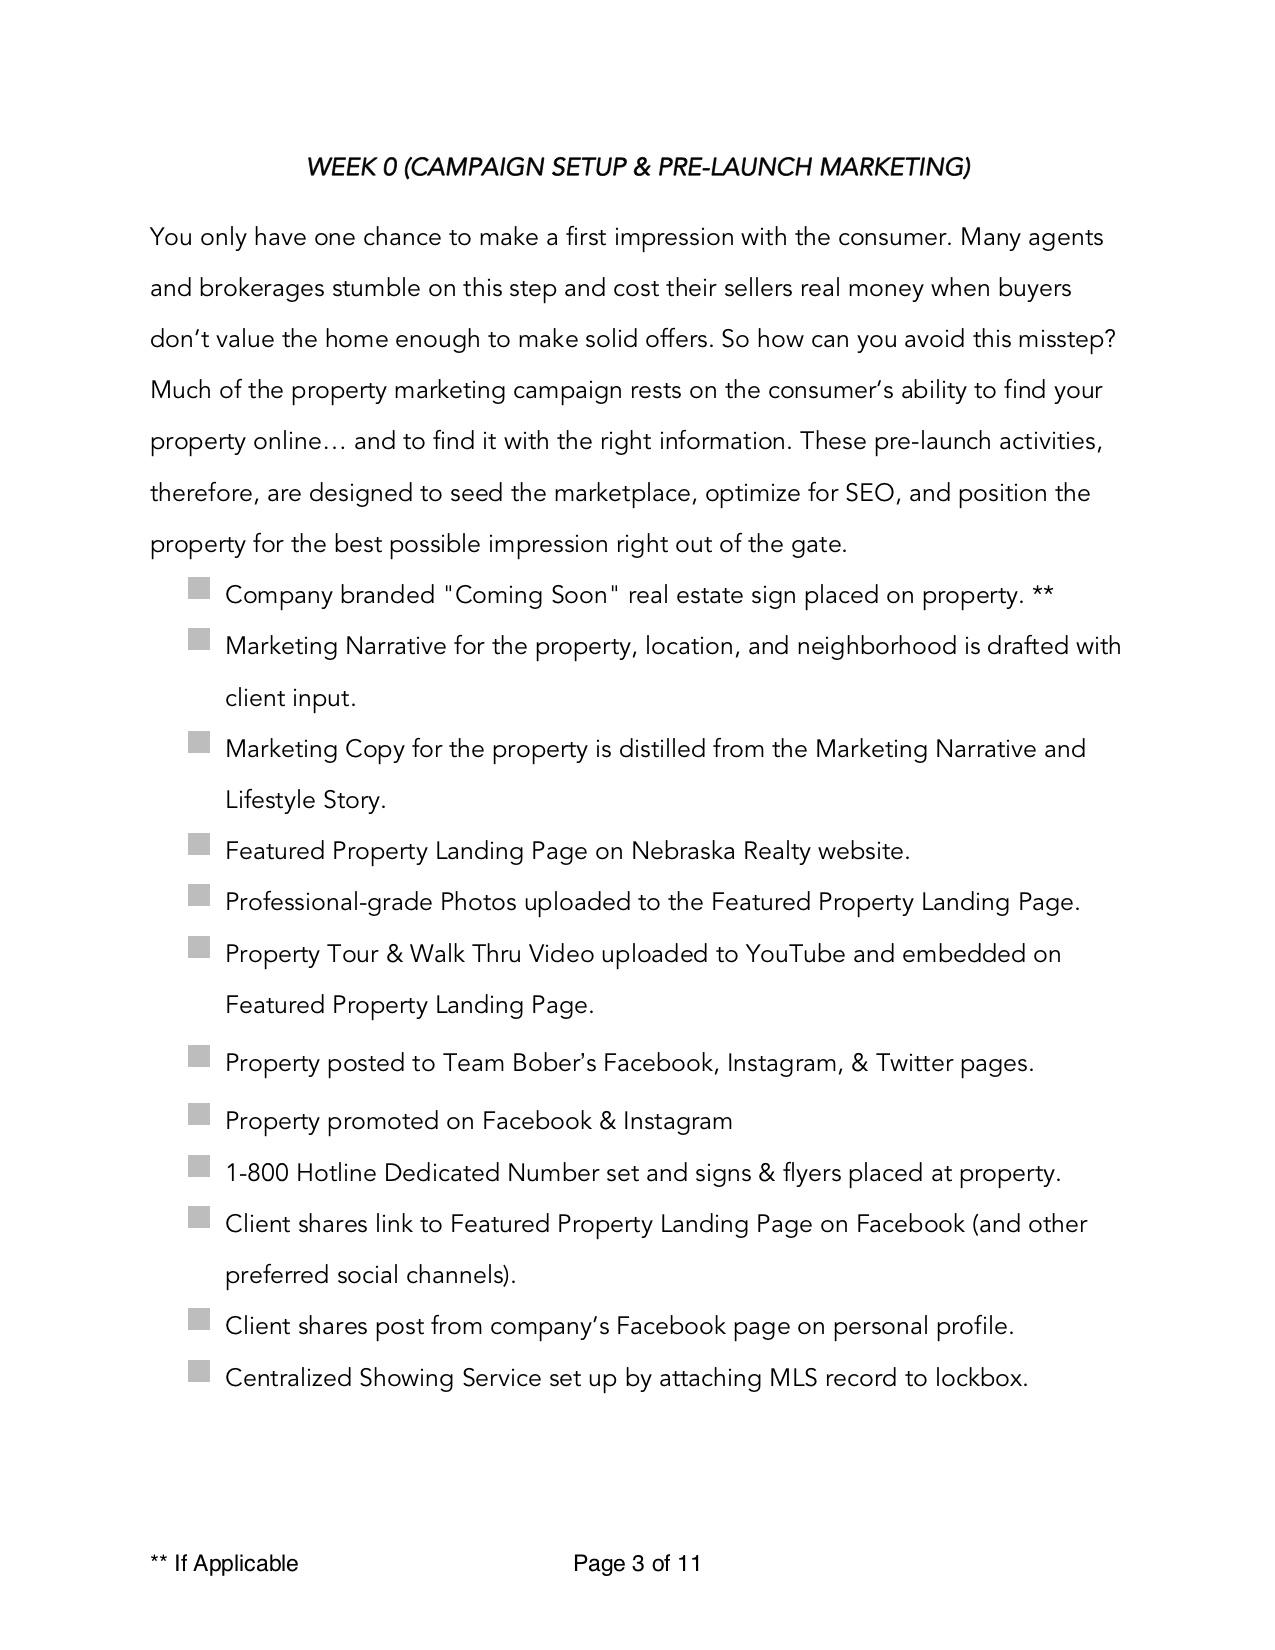 8 Week Marketing Plan3.jpg